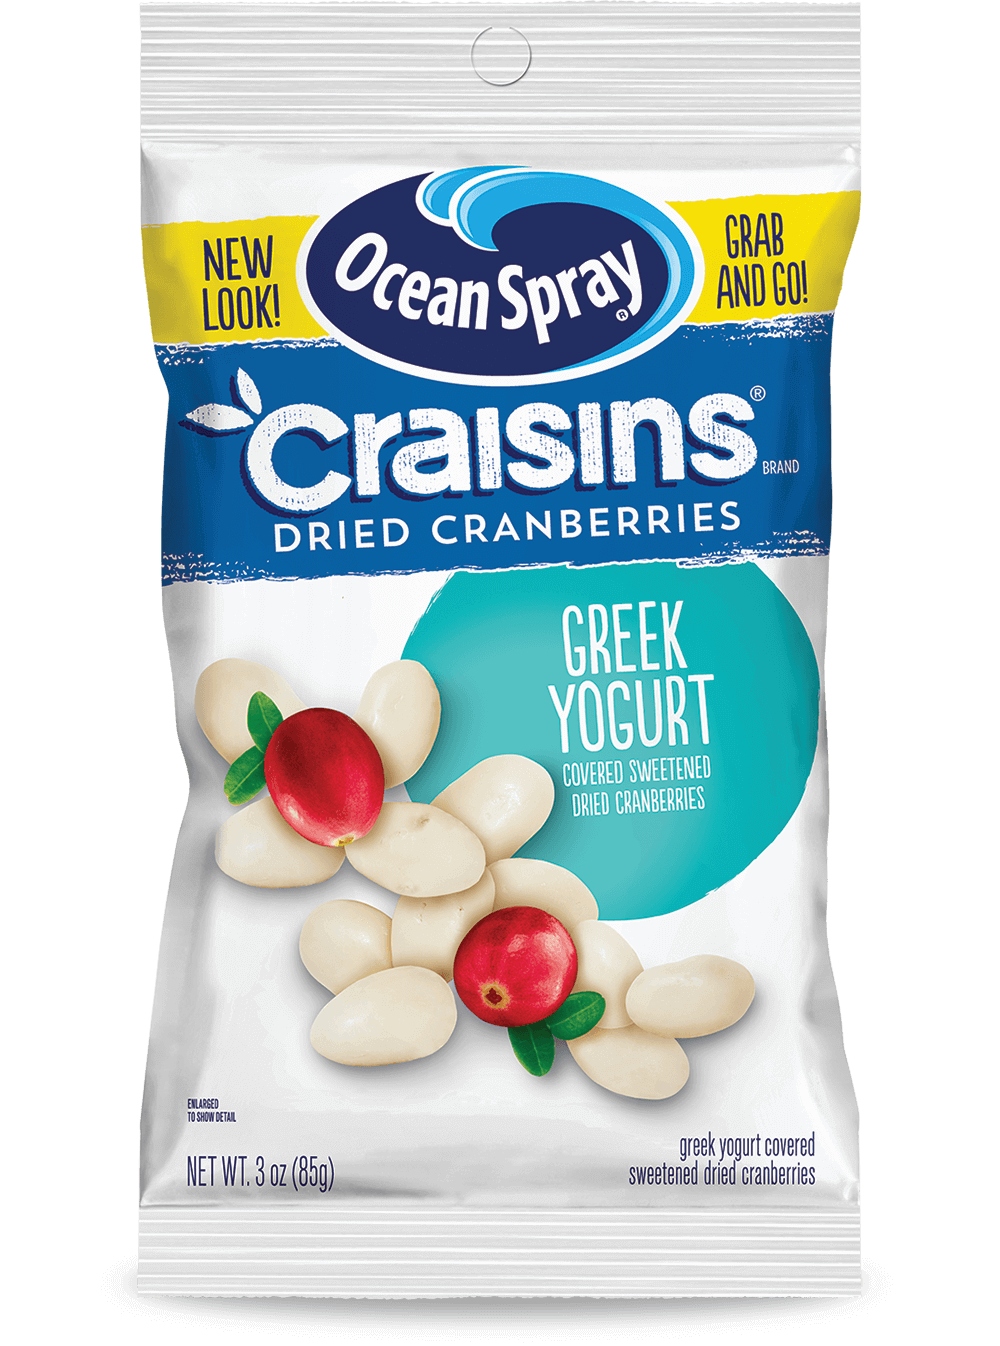 Greek Yogurt Covered Craisins® Dried Cranberries